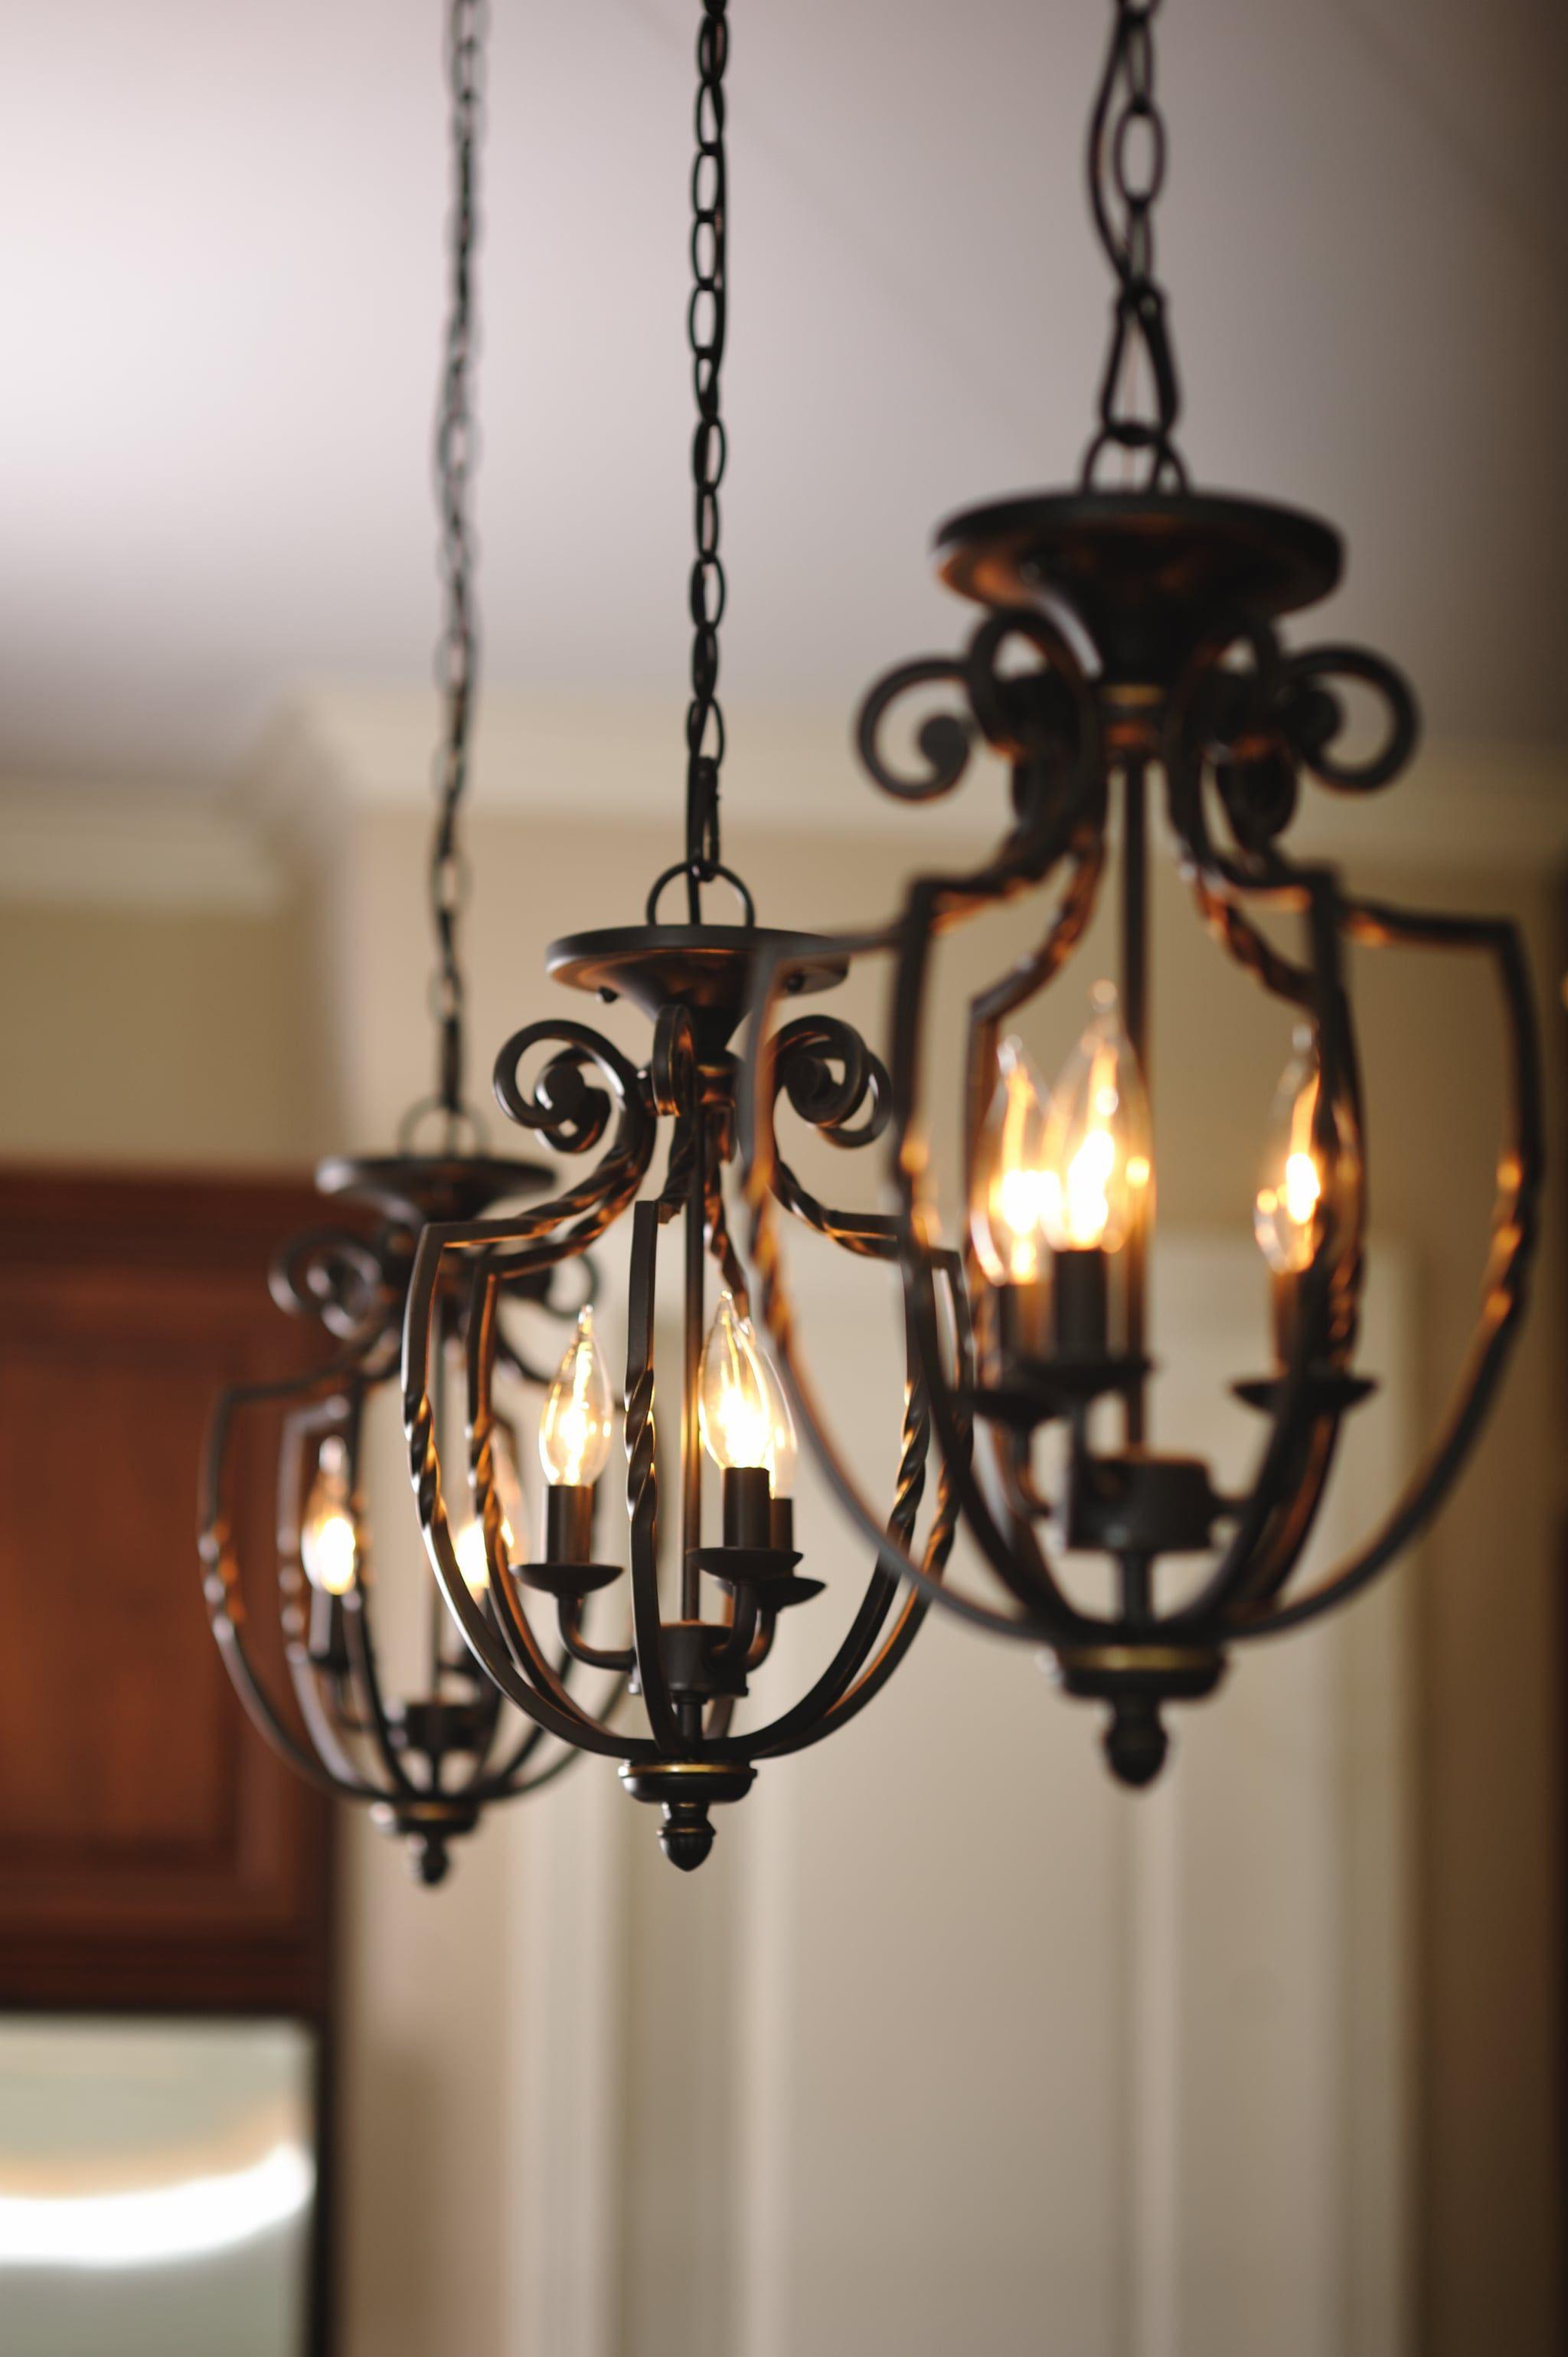 Make Use Of Light Fixtures Rustic Light Fixtures Wrought Iron Light Fixtures Iron Light Fixtures